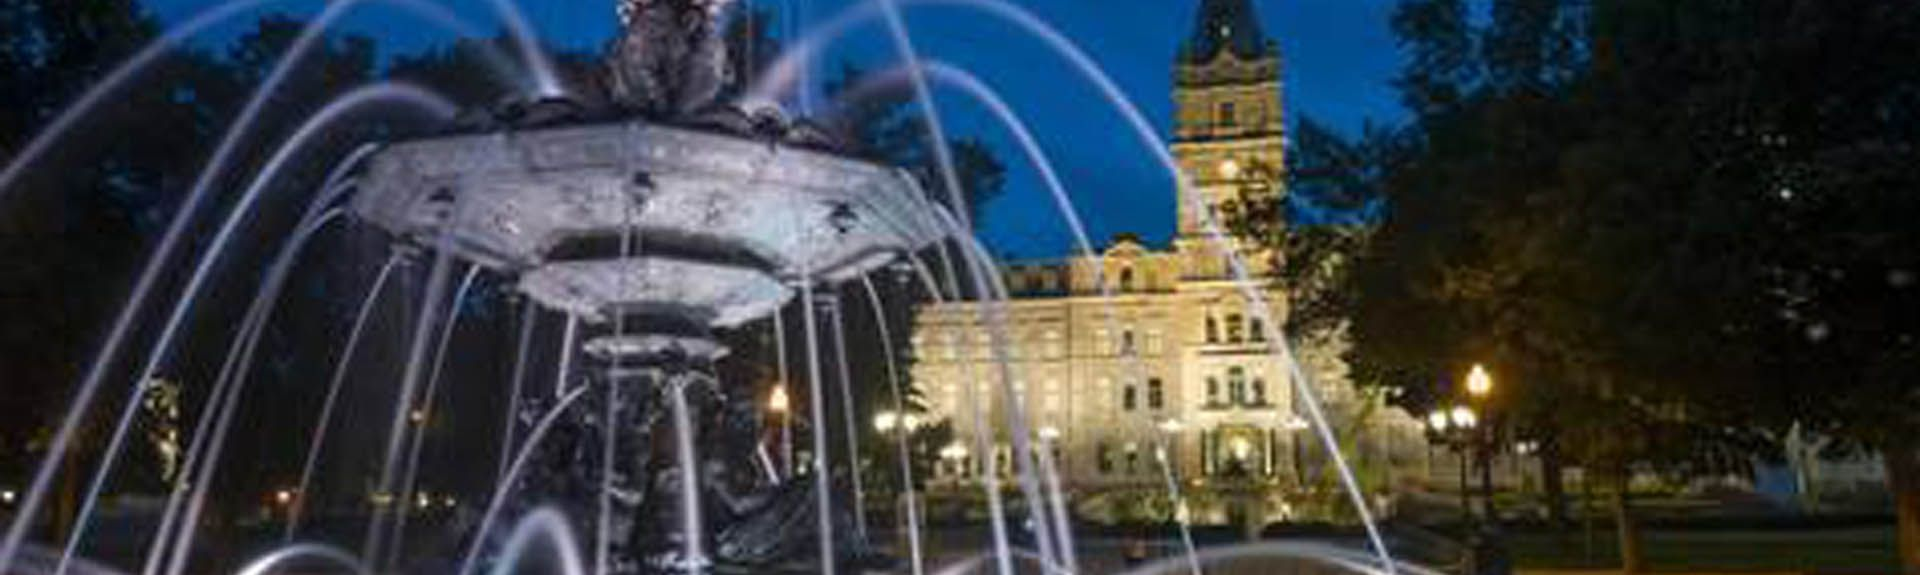 Sillery, Québec City, Québec, Canada